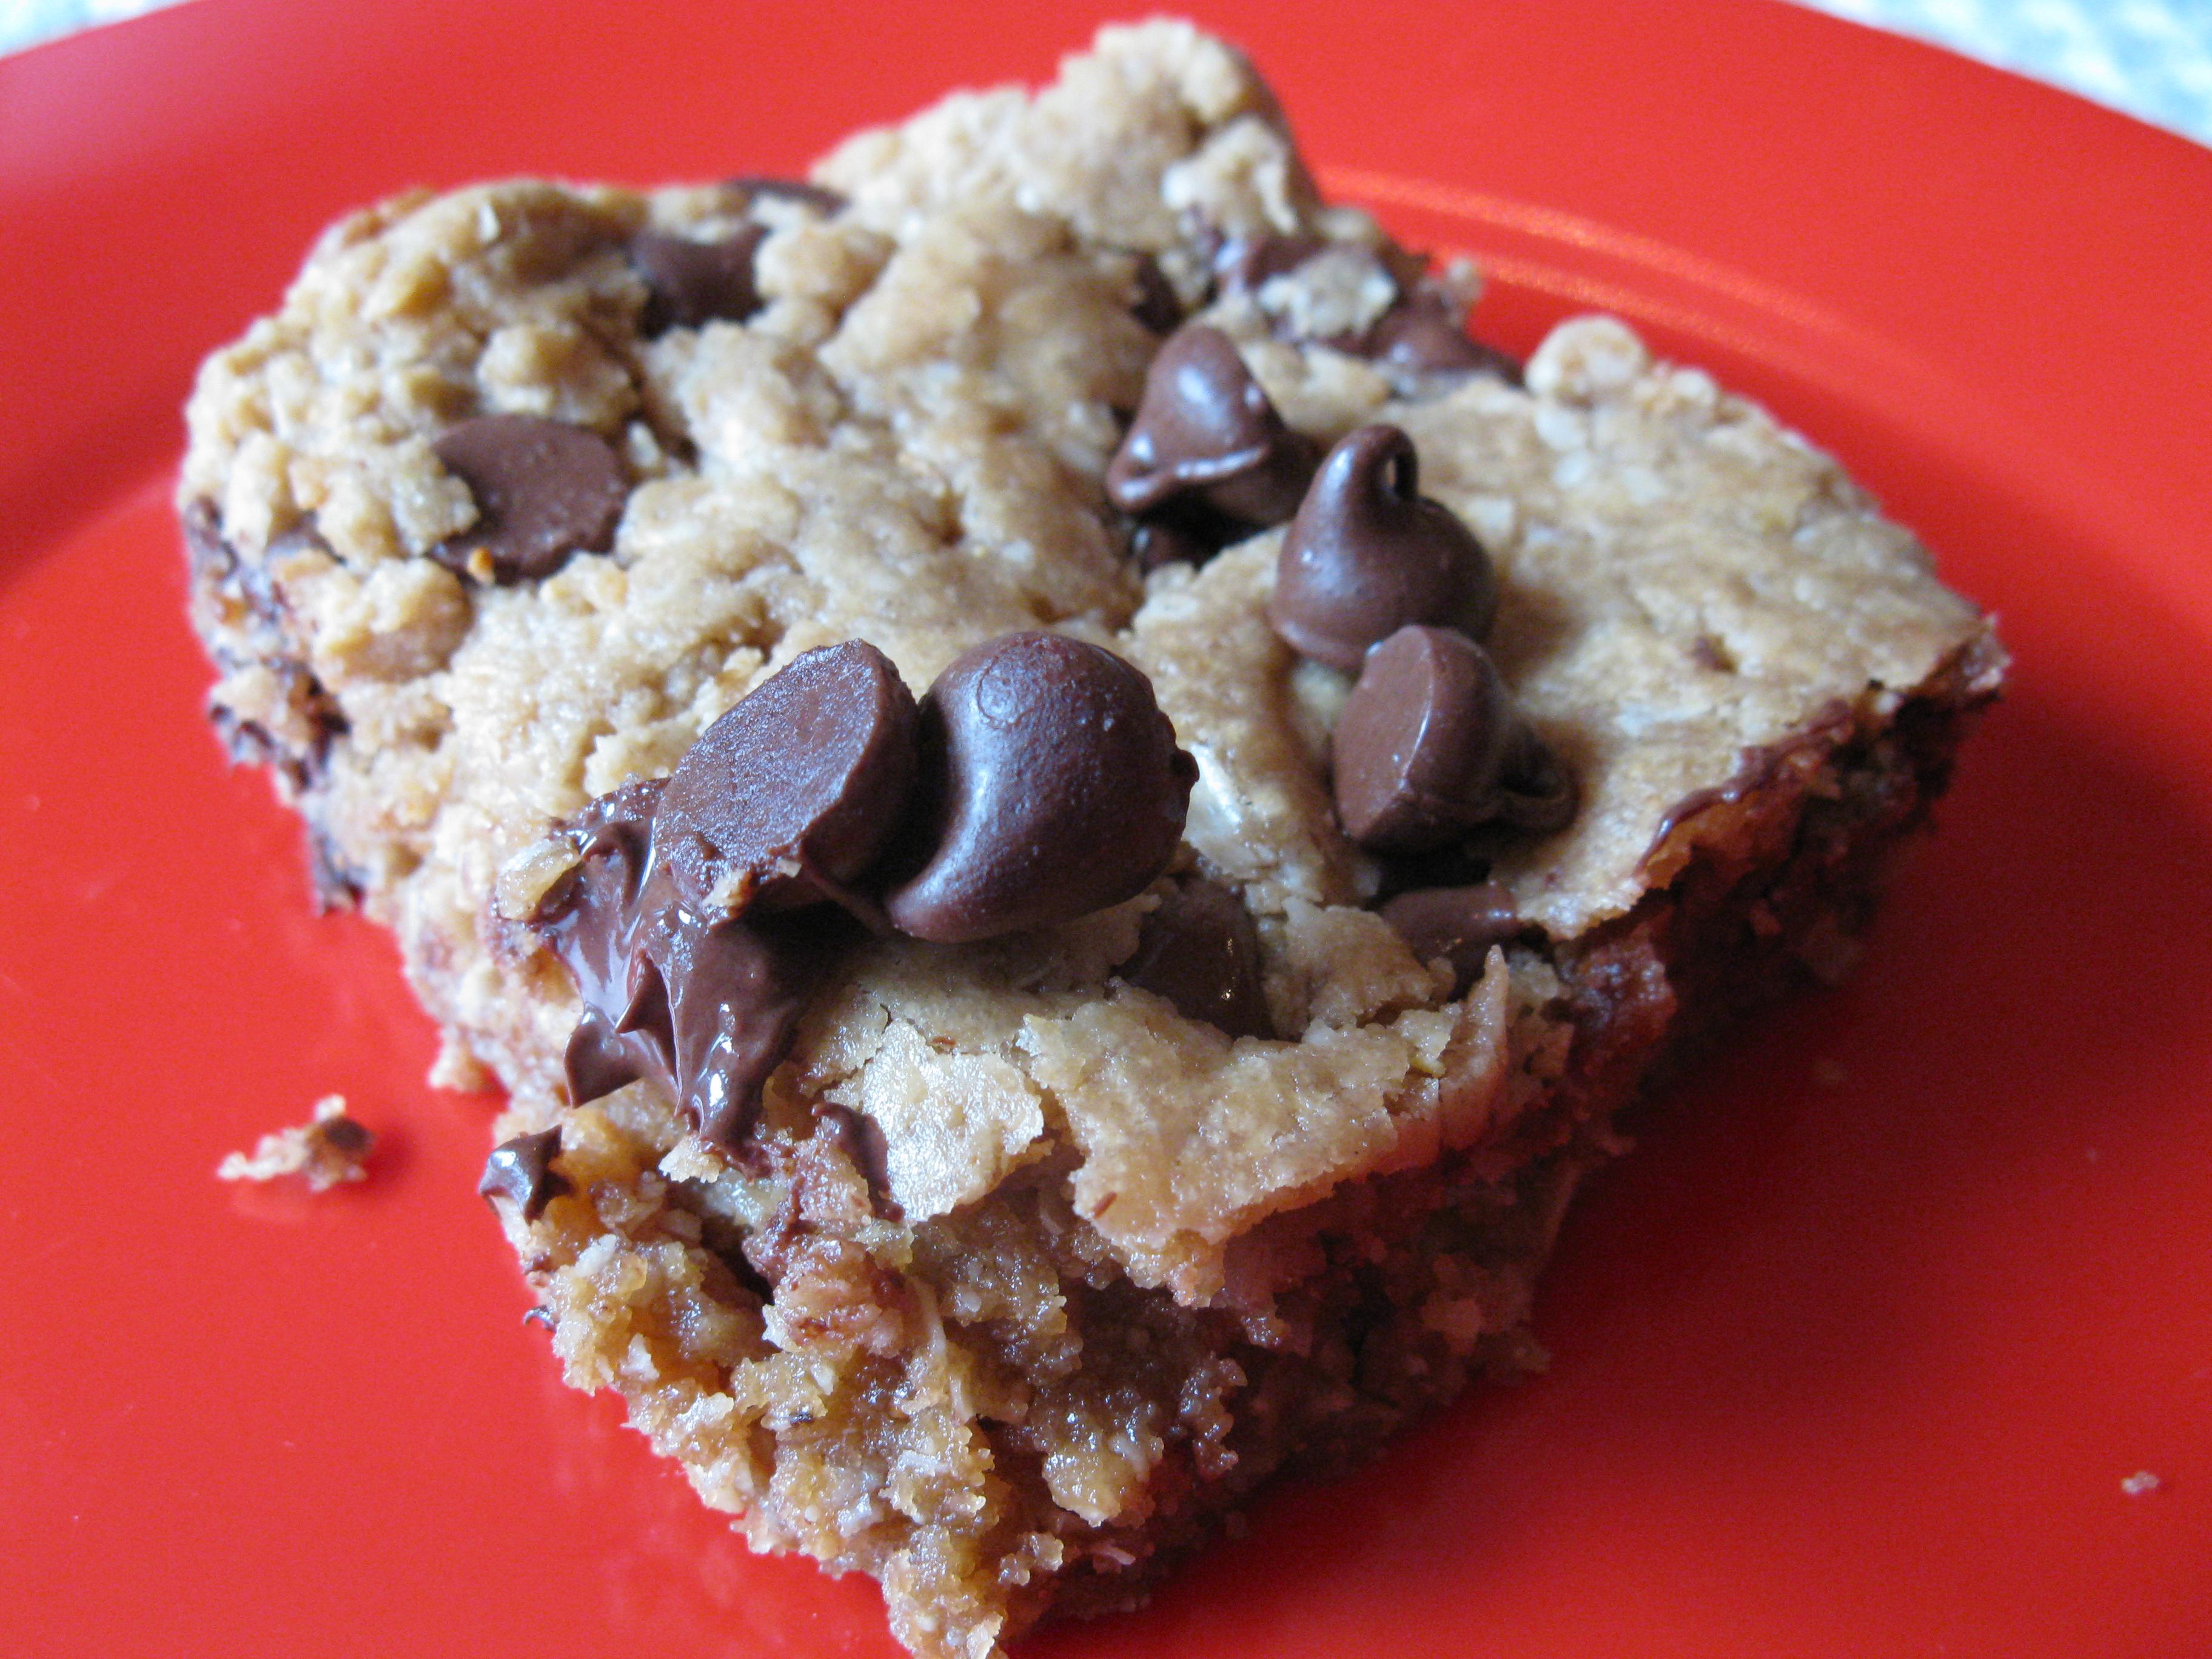 Best Oatmeal Peanut Butter Chocolate Chip Cookie Recipe